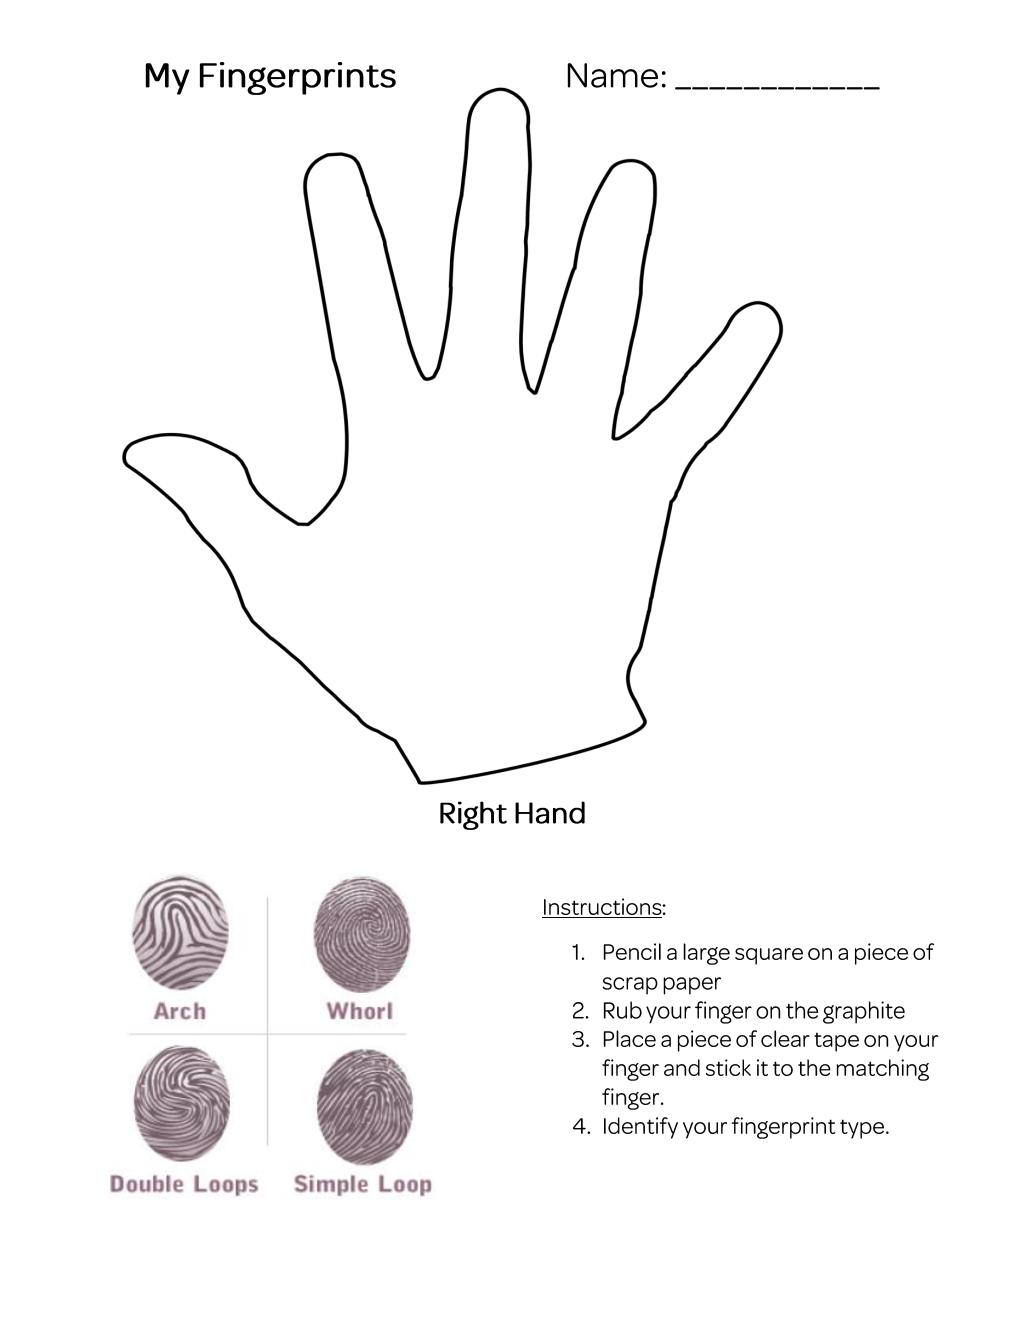 My Fingerprints Worksheet